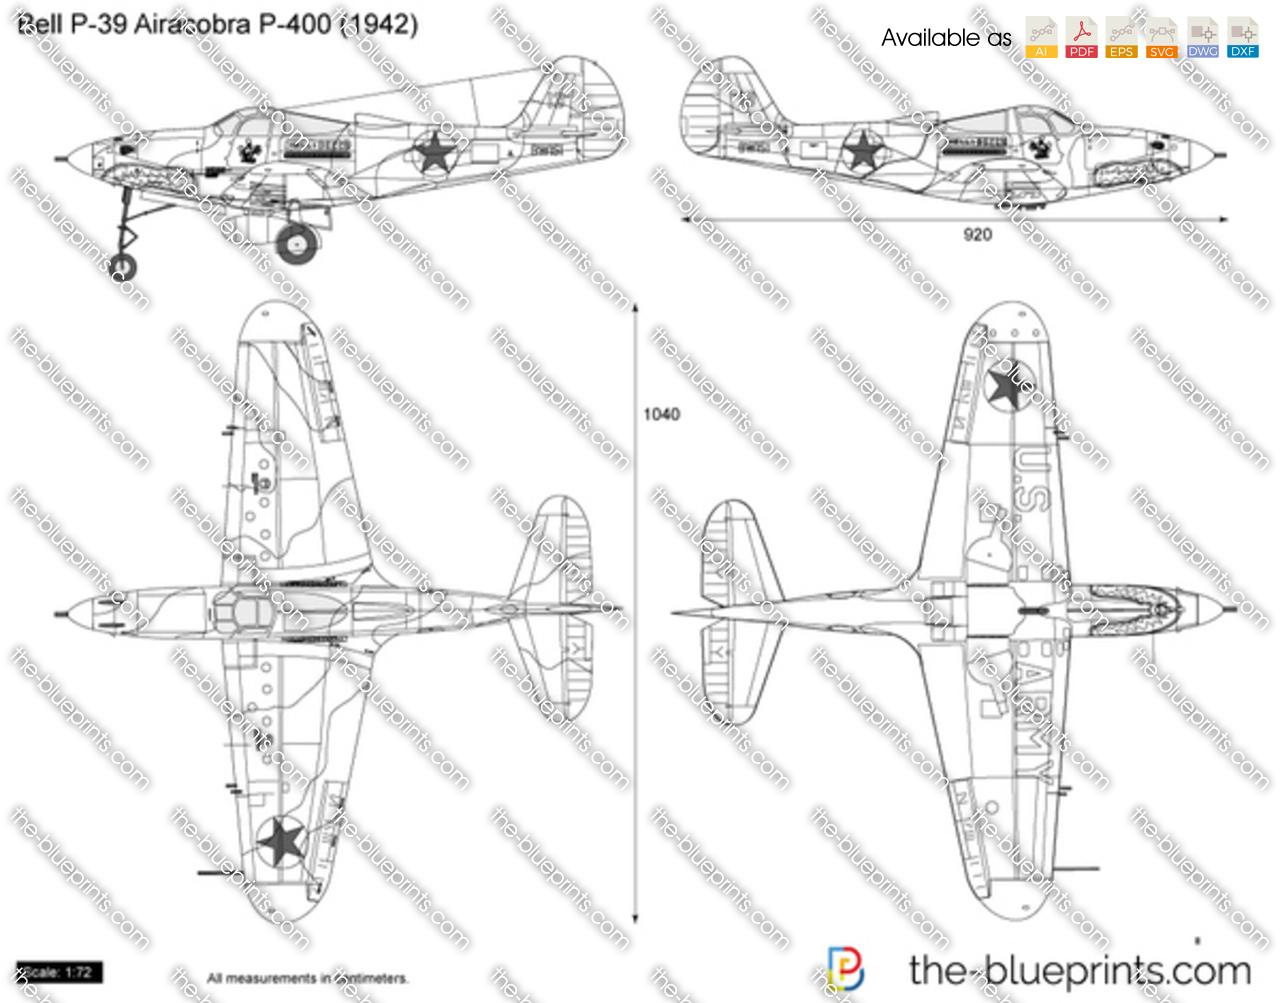 Bell P-39 Airacobra P-400